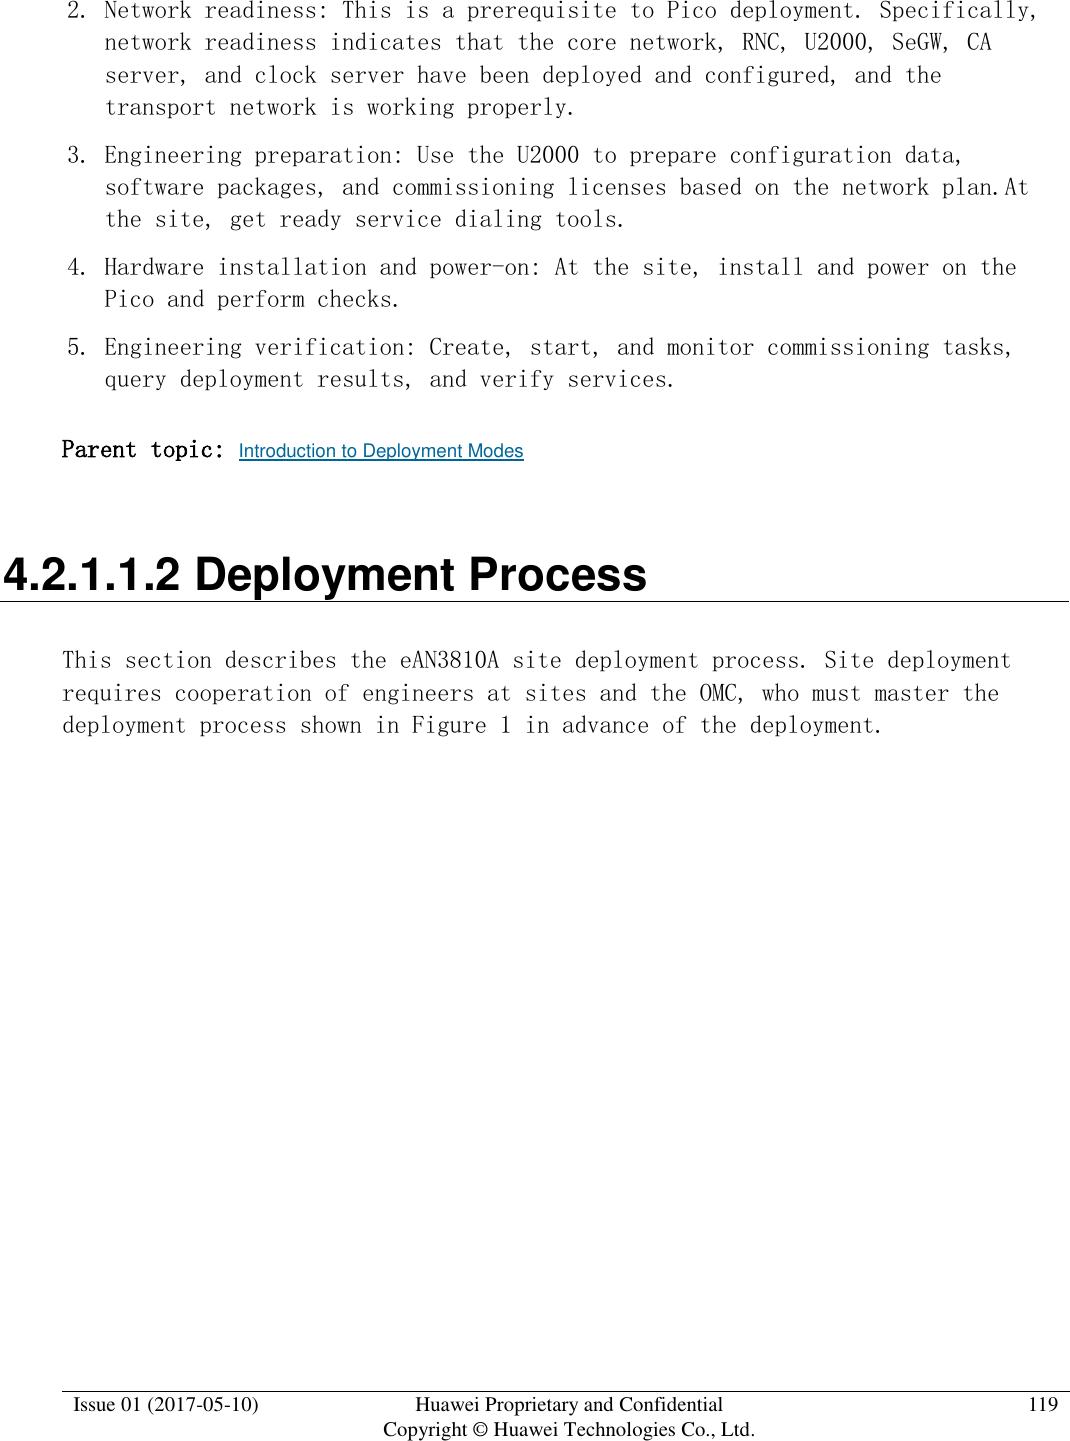 Huawei Technologies EAN3810A eLTE-U Airnode User Manual